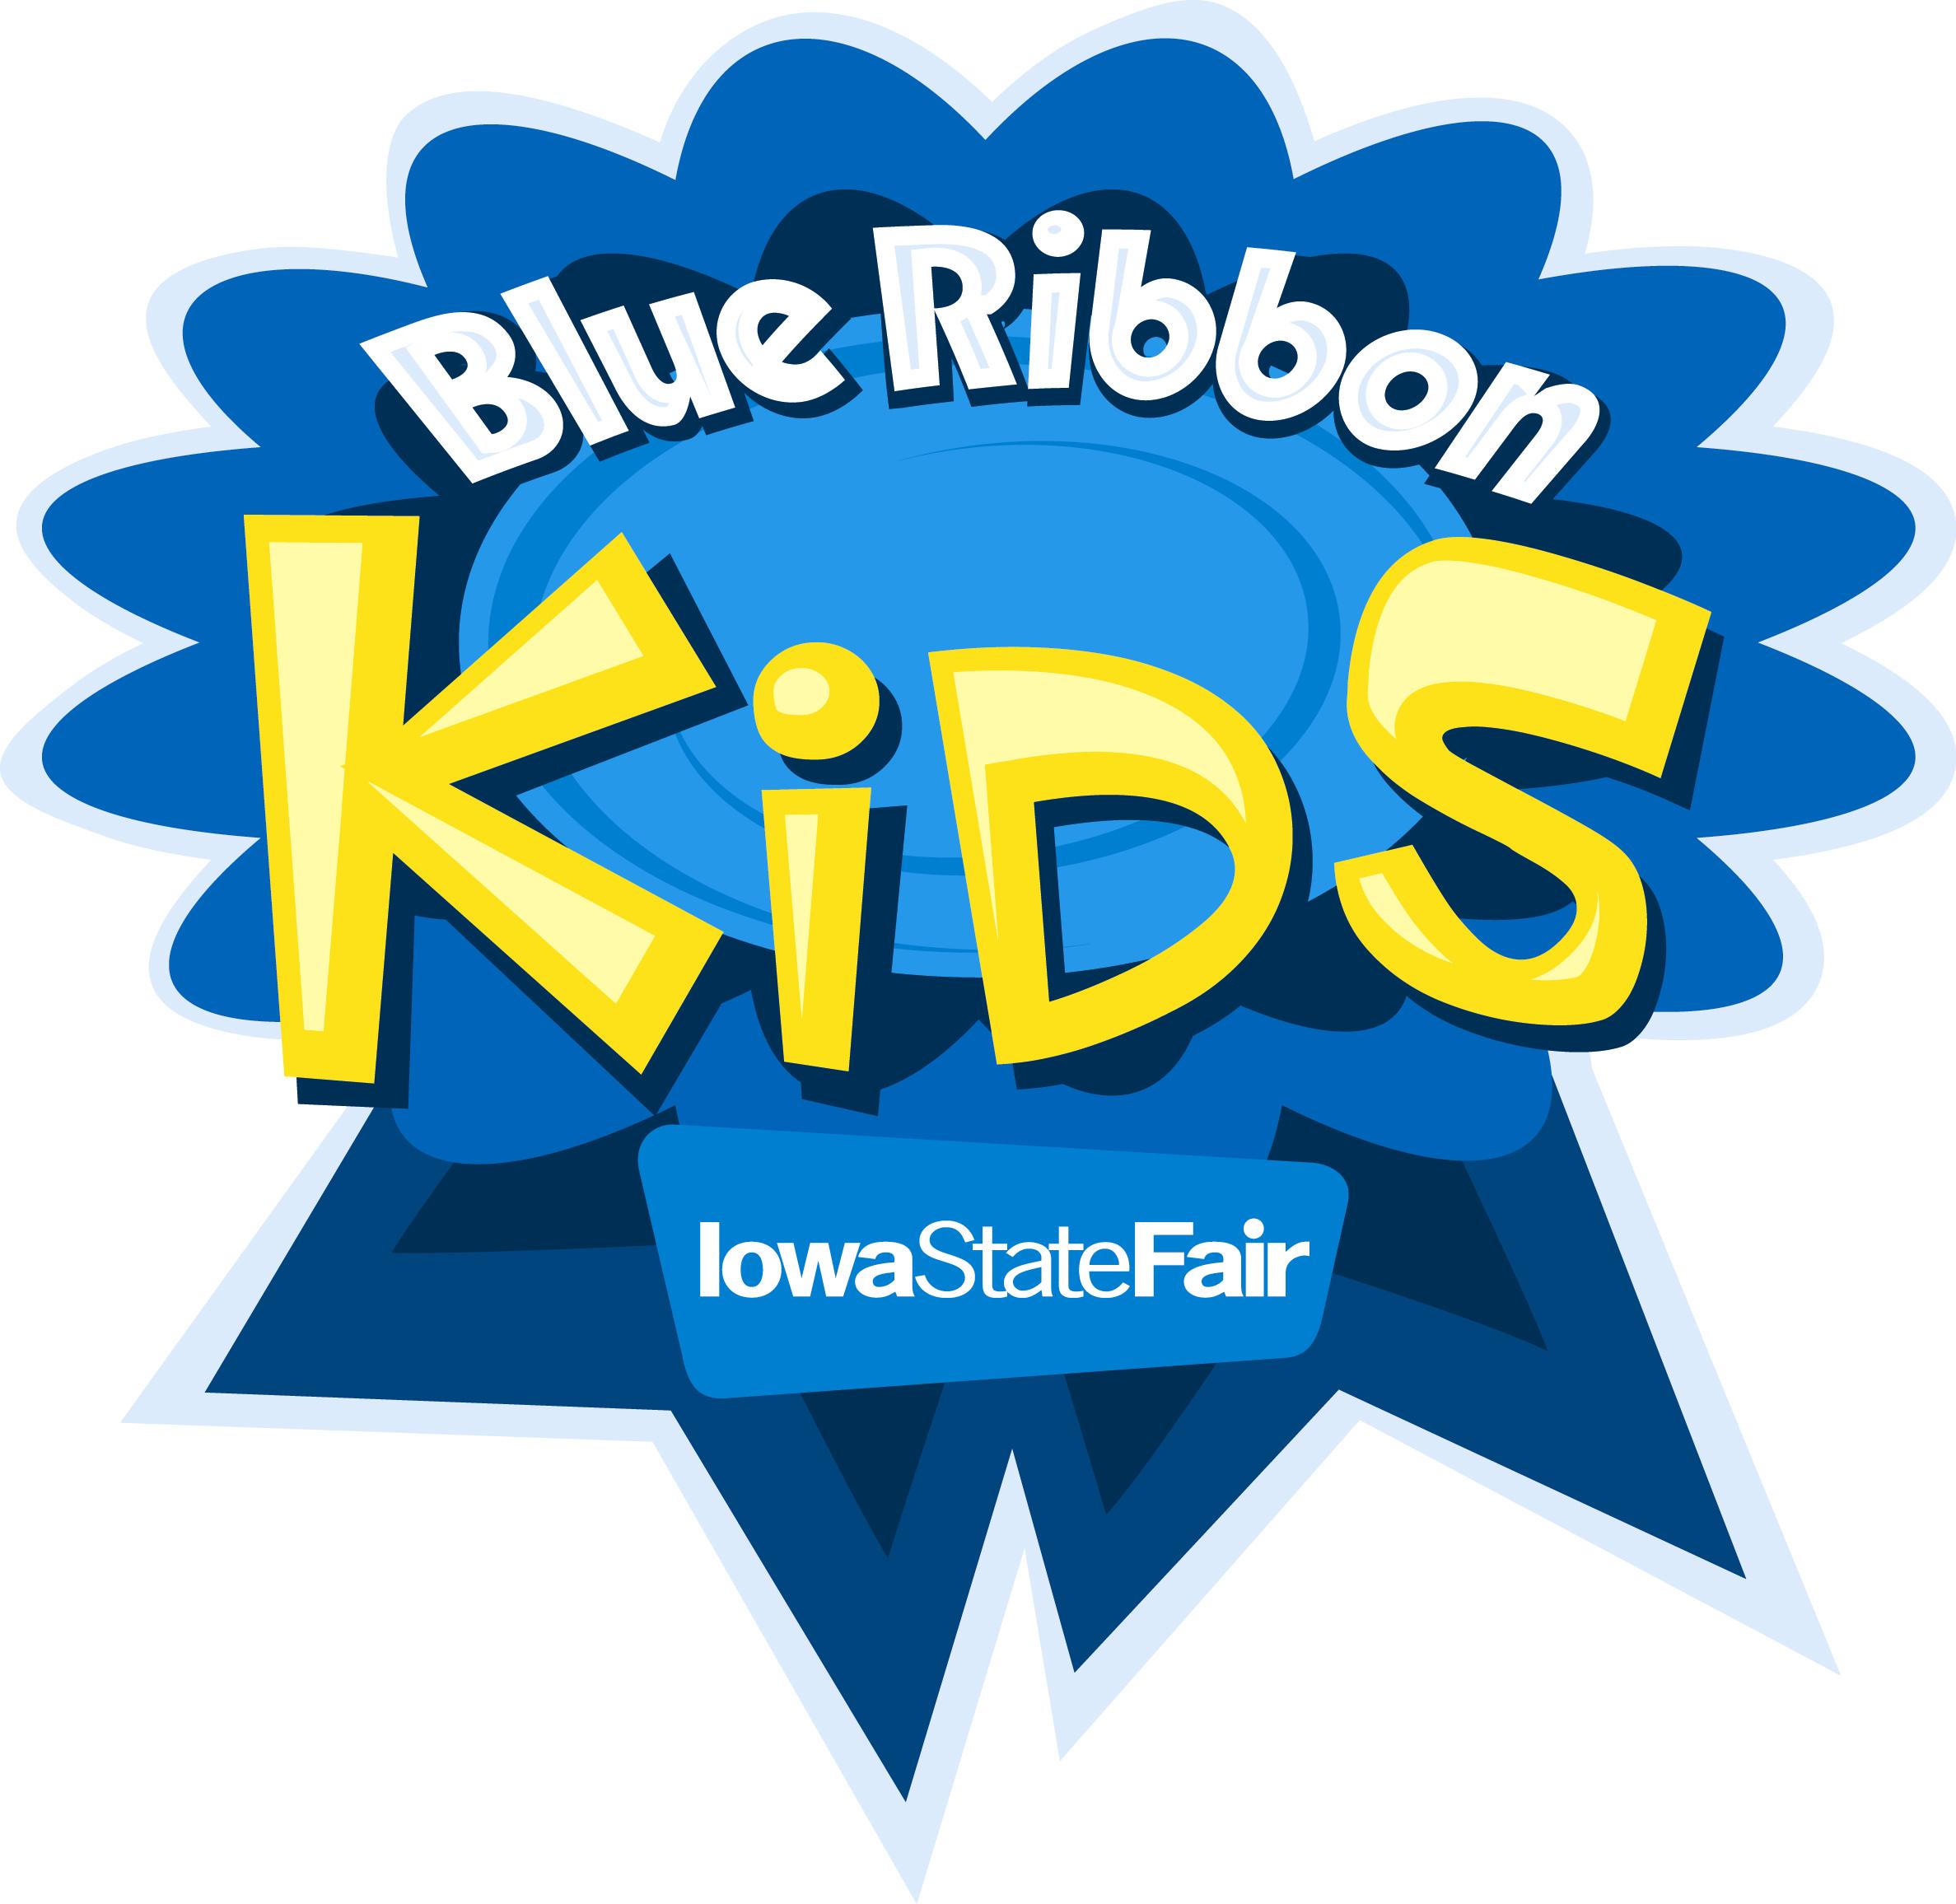 Blue Ribbon Kids Club Logo